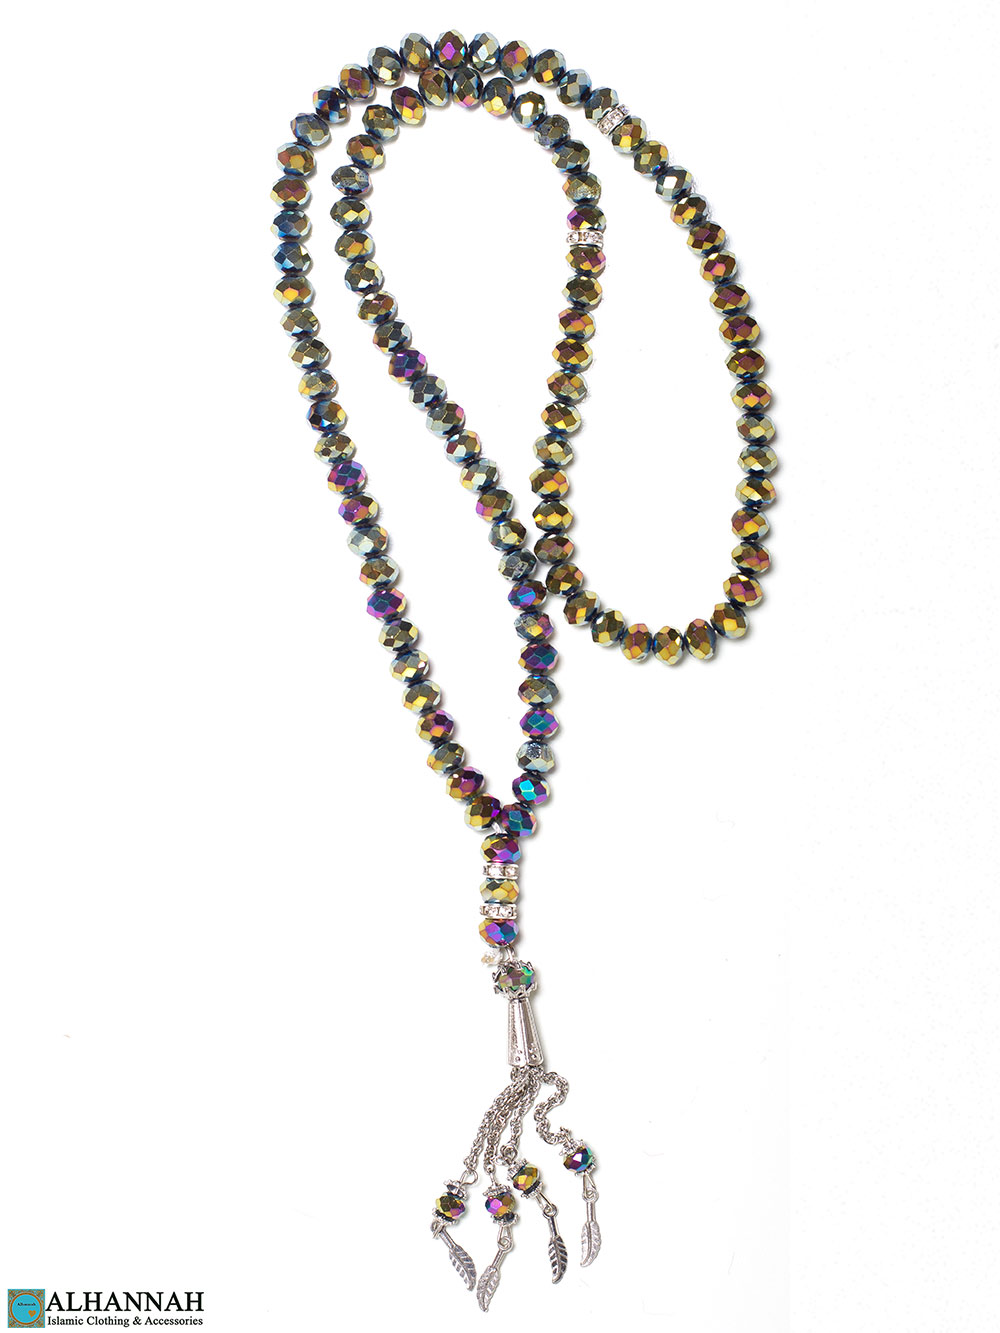 Crystal Prayer Beads 99 Iridescent Tones